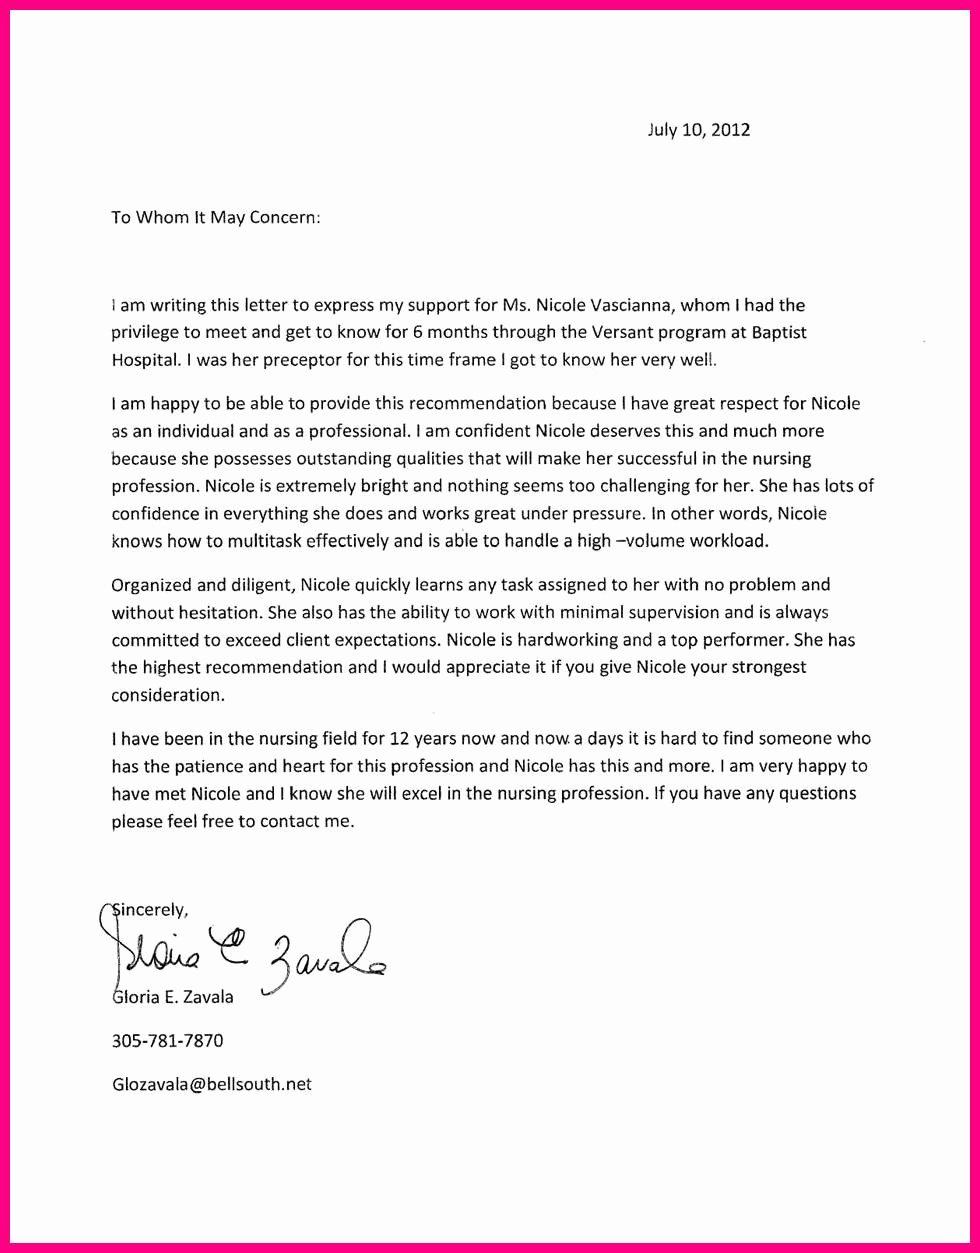 Nurse Practitioner Letter Of Recommendation Elegant 20 Of Nurse Practitioner Re Mendation Letter